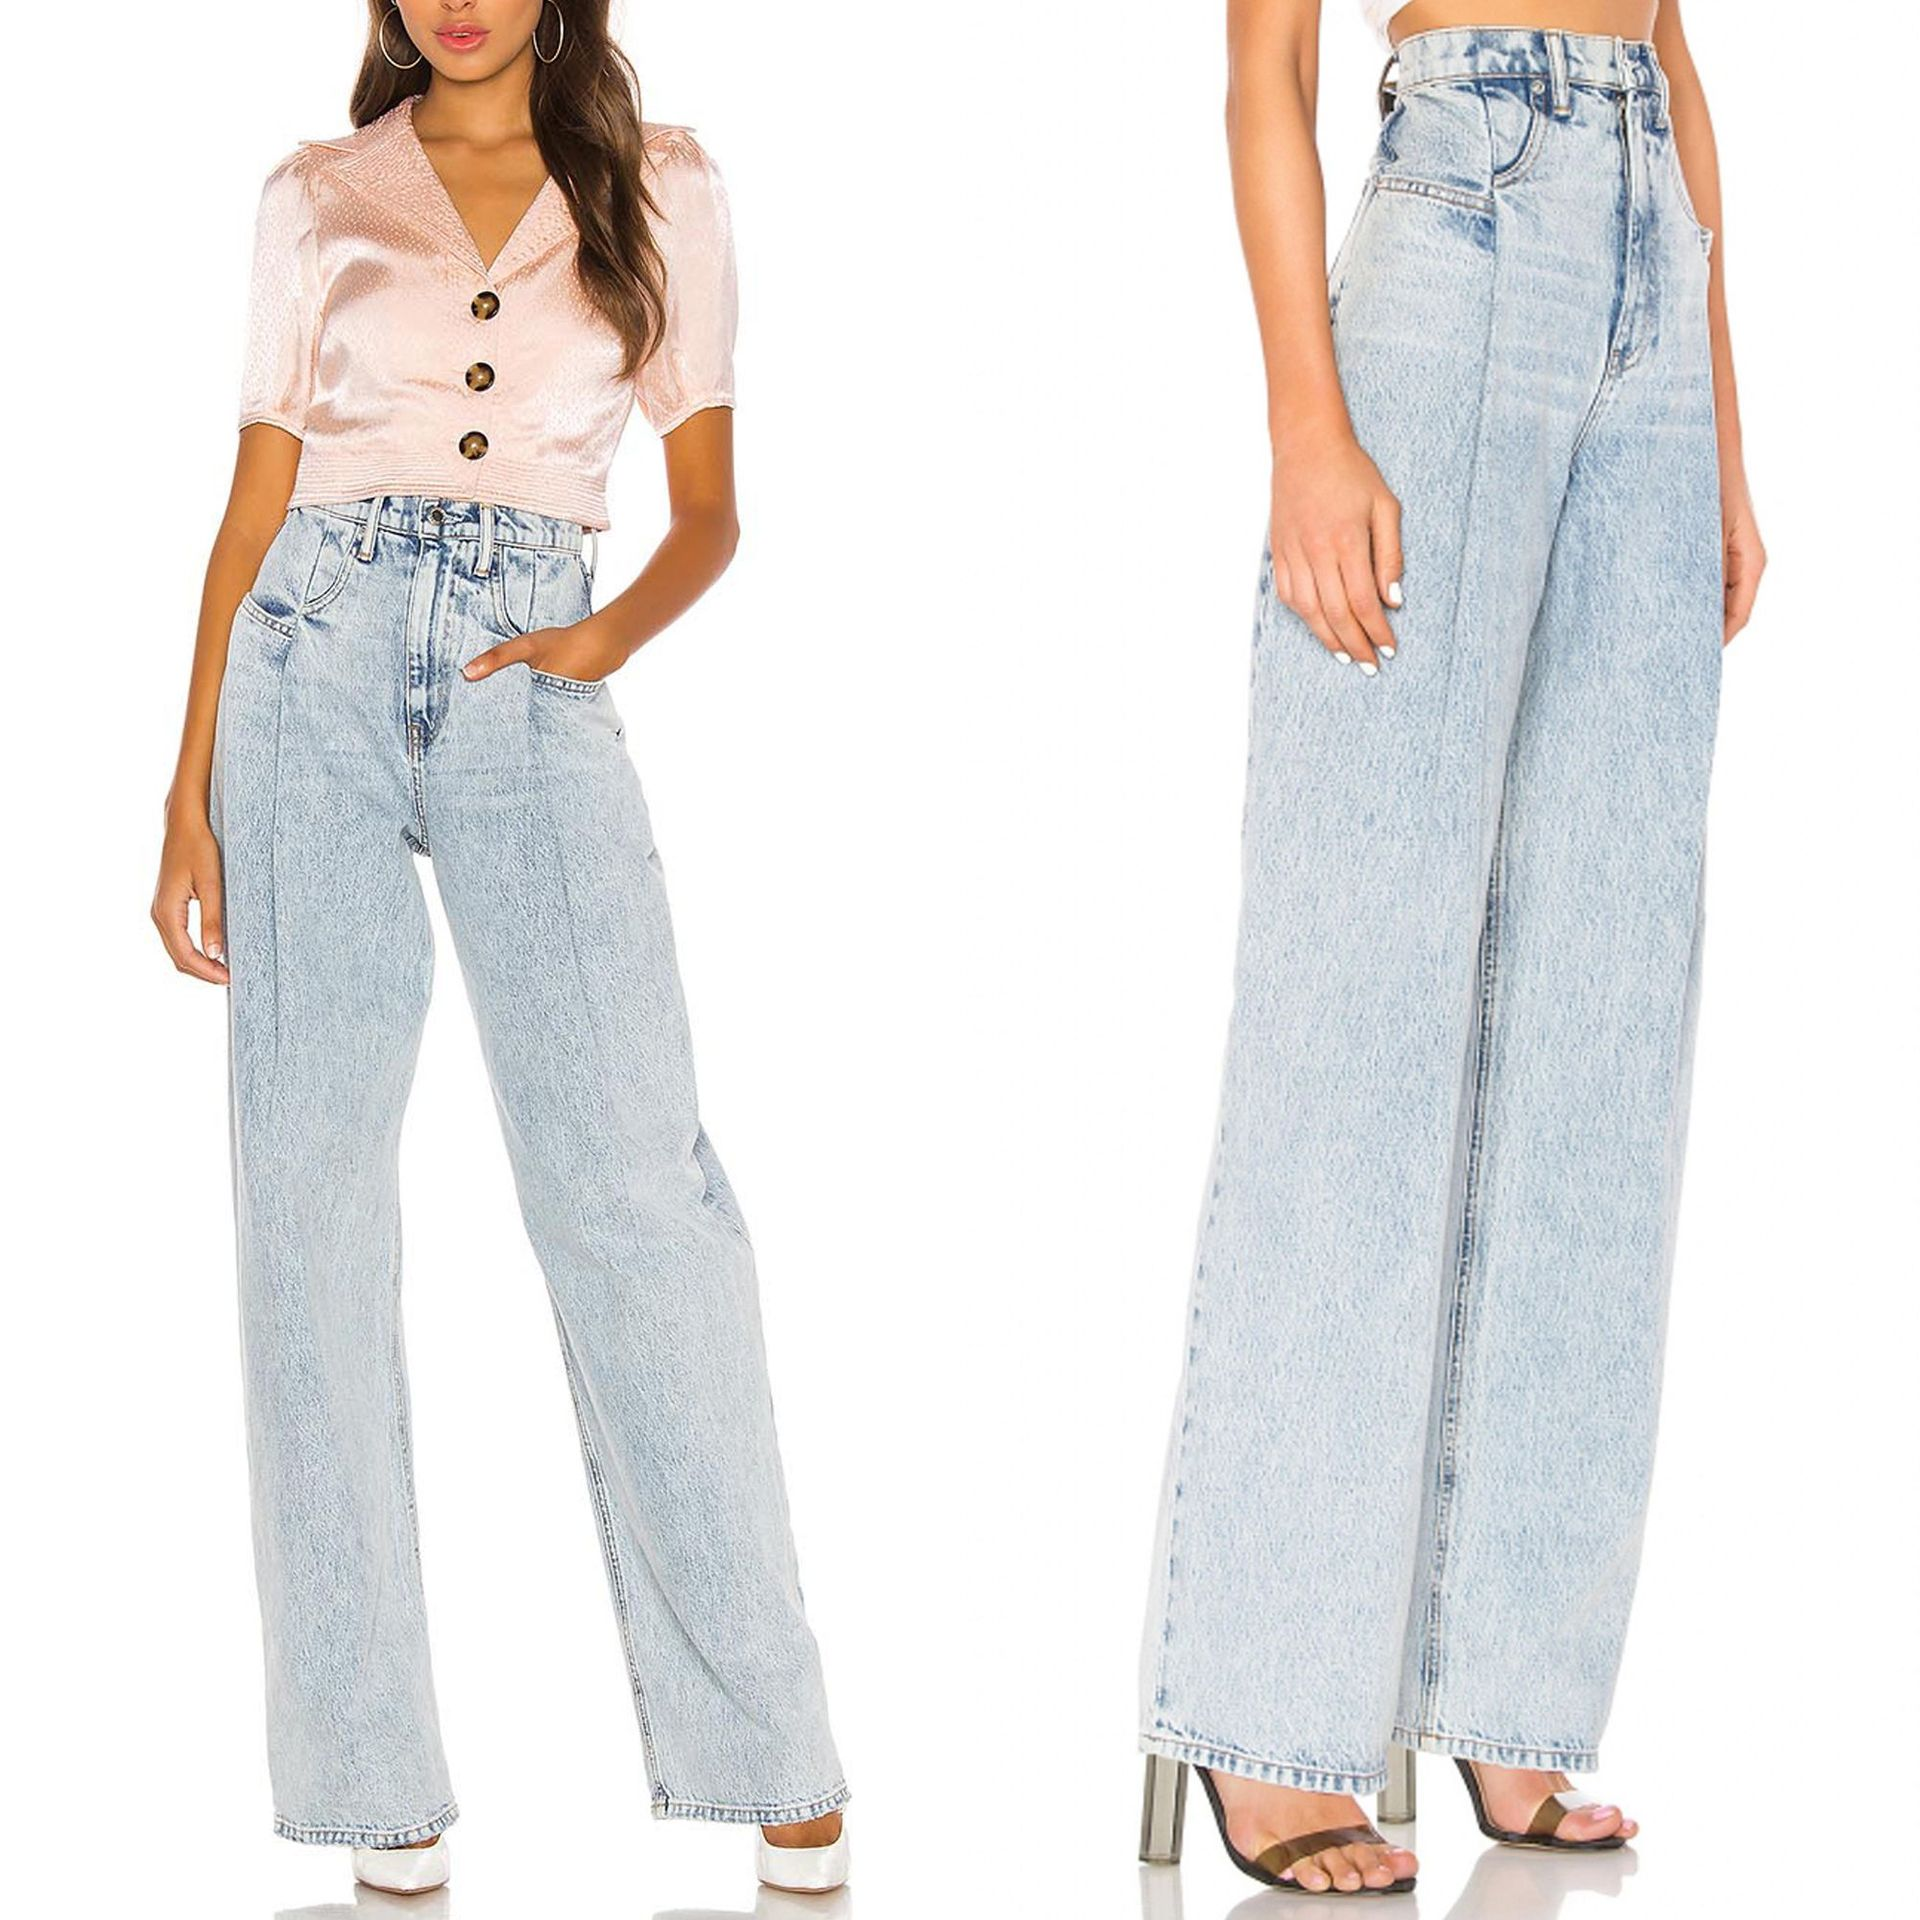 kpop Celebrity ROSE the same summer High waist Wide Leg Loose Straight Jeans women streetwear fashion Loose Straight denim pants 4